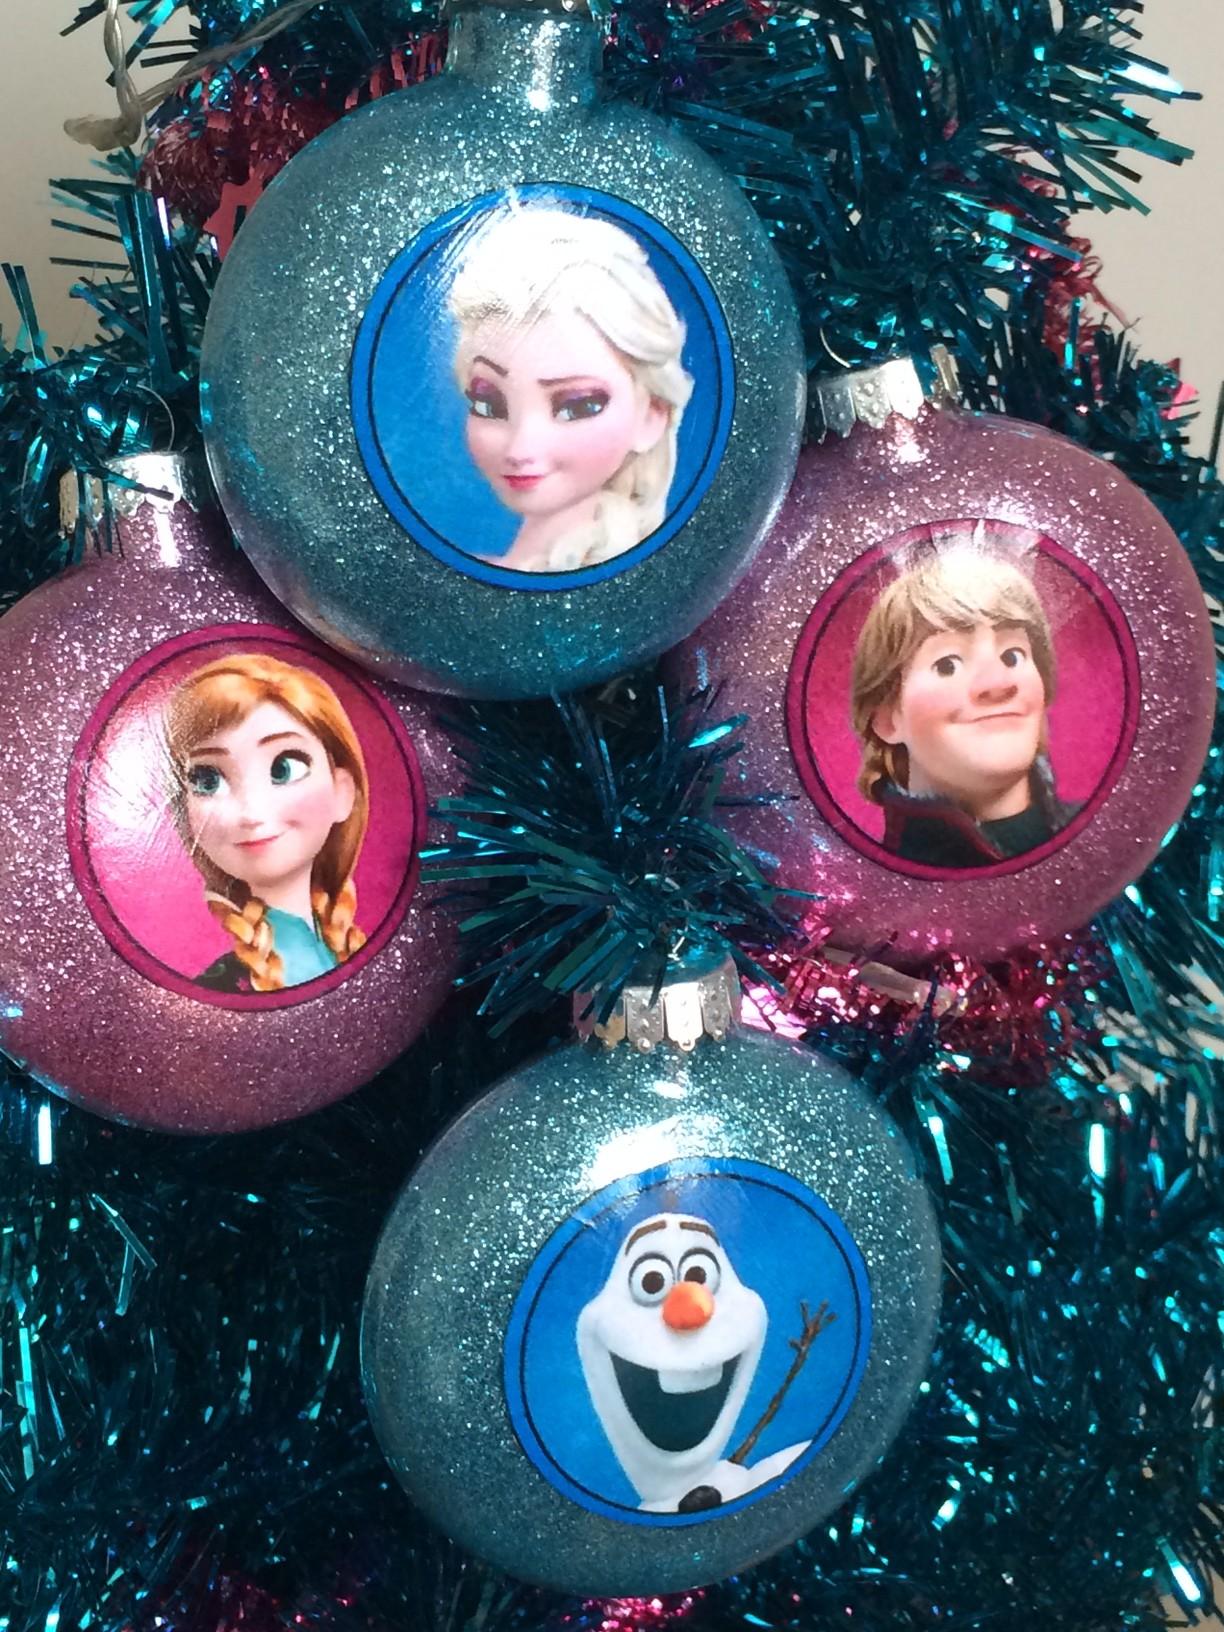 Disney frozen ornaments - Disney Frozen Ornaments